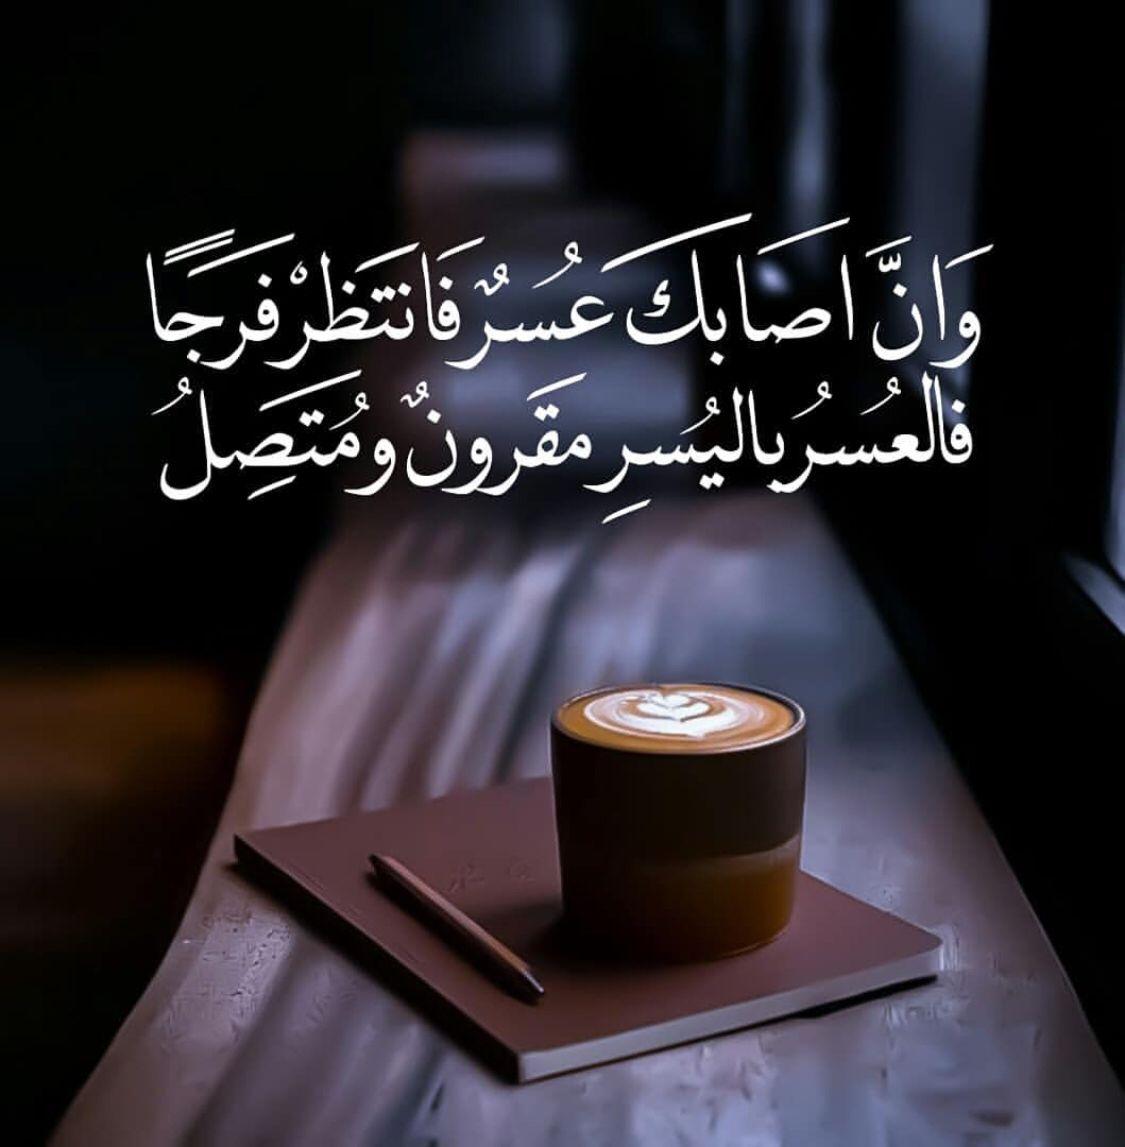 Pin By Angelina Love On مواعظ خواطر إسلامية Beautiful Quran Quotes Beautiful Arabic Words Arabic Quotes